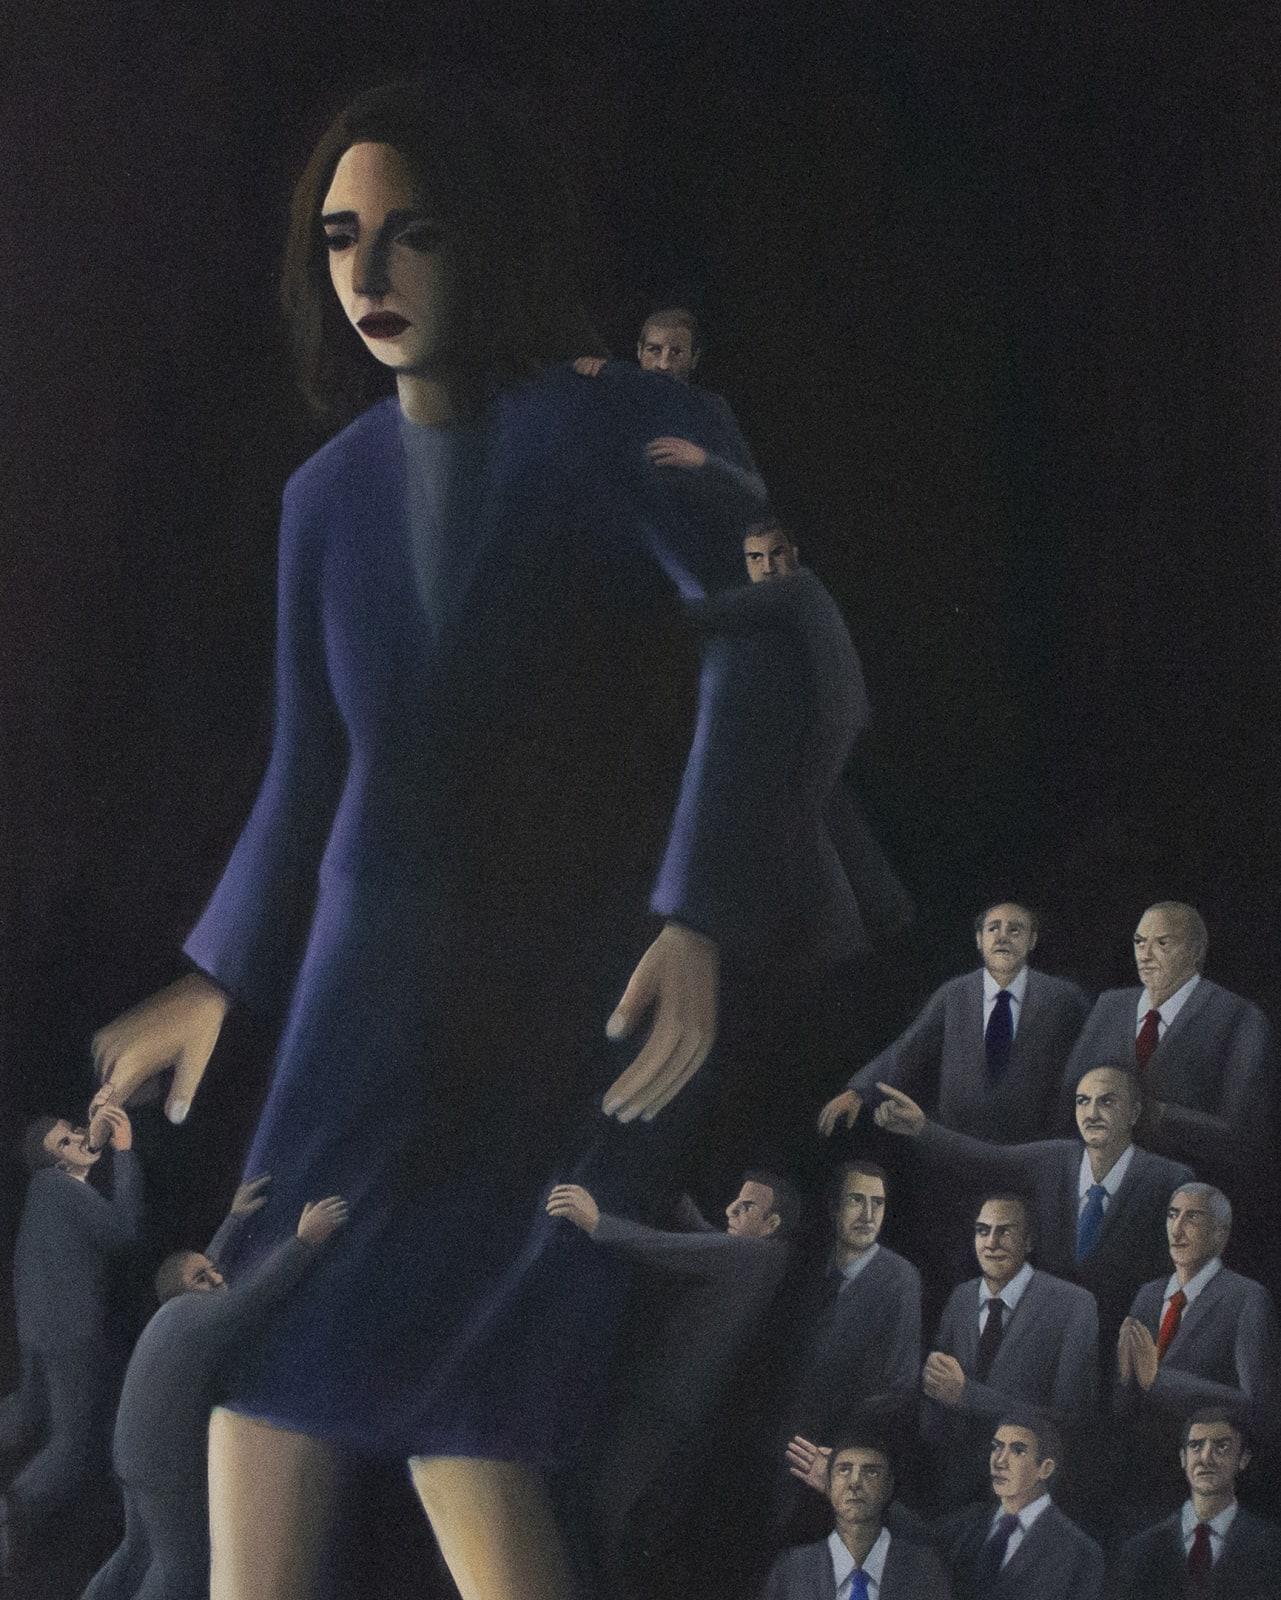 Vanessa Gully Santiago, Trolls, 24 x 30 inches, Oil on Canvas, 2020